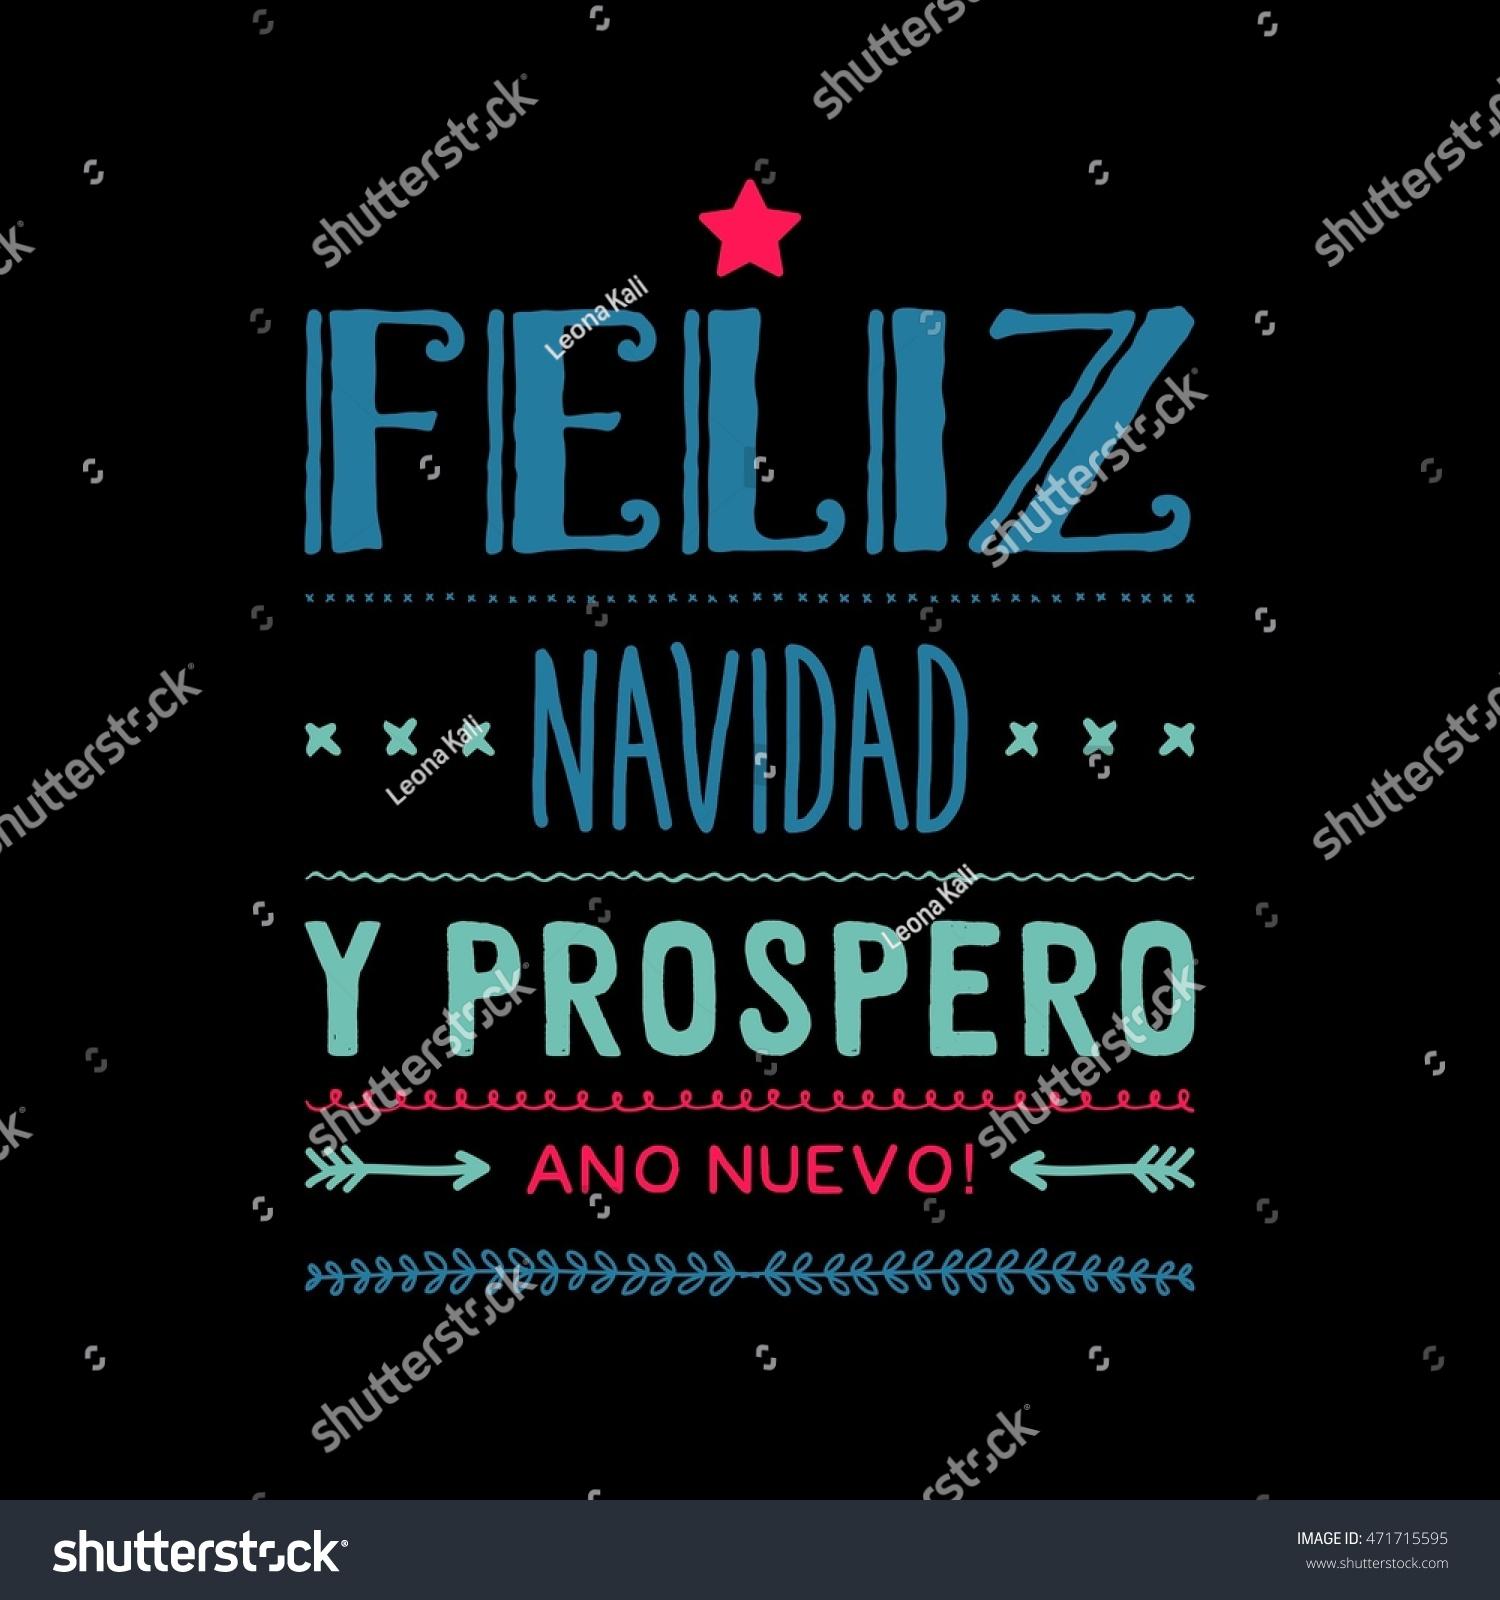 Merry Christmas Card Template Greetings Spanish Stock Illustration ...